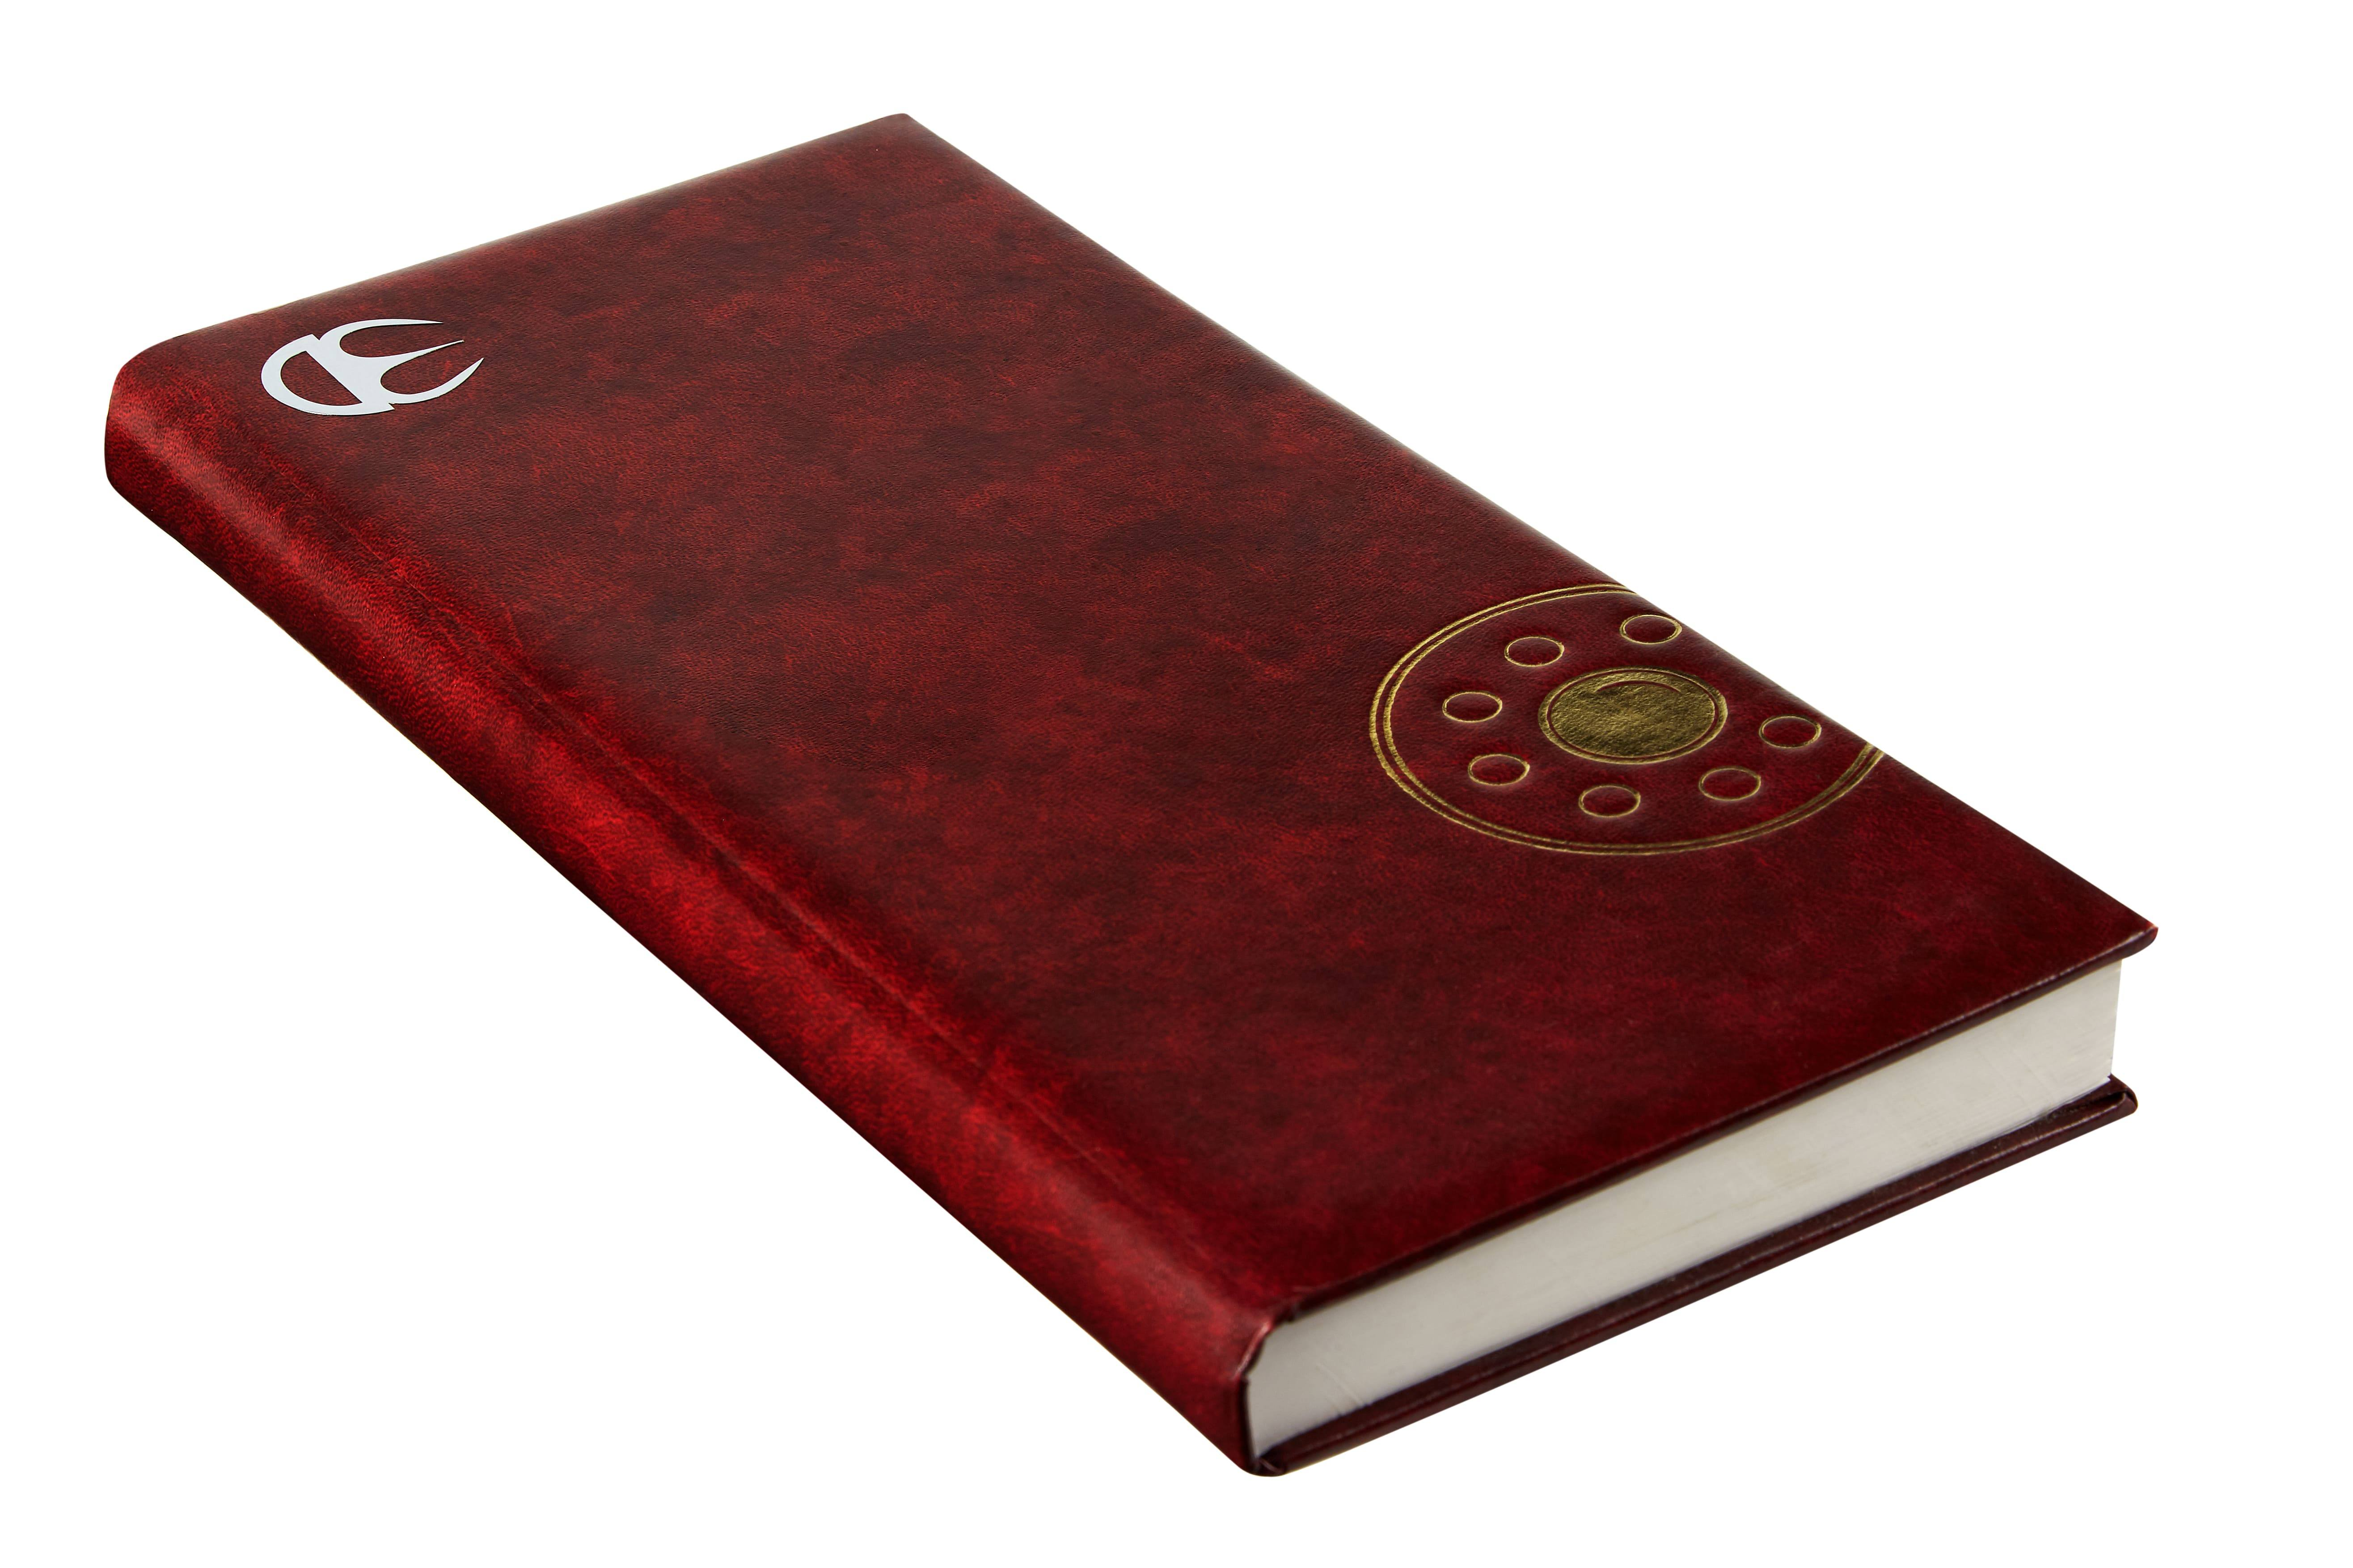 Фото ежедневника с нанесением на кожзам золотого логотипа